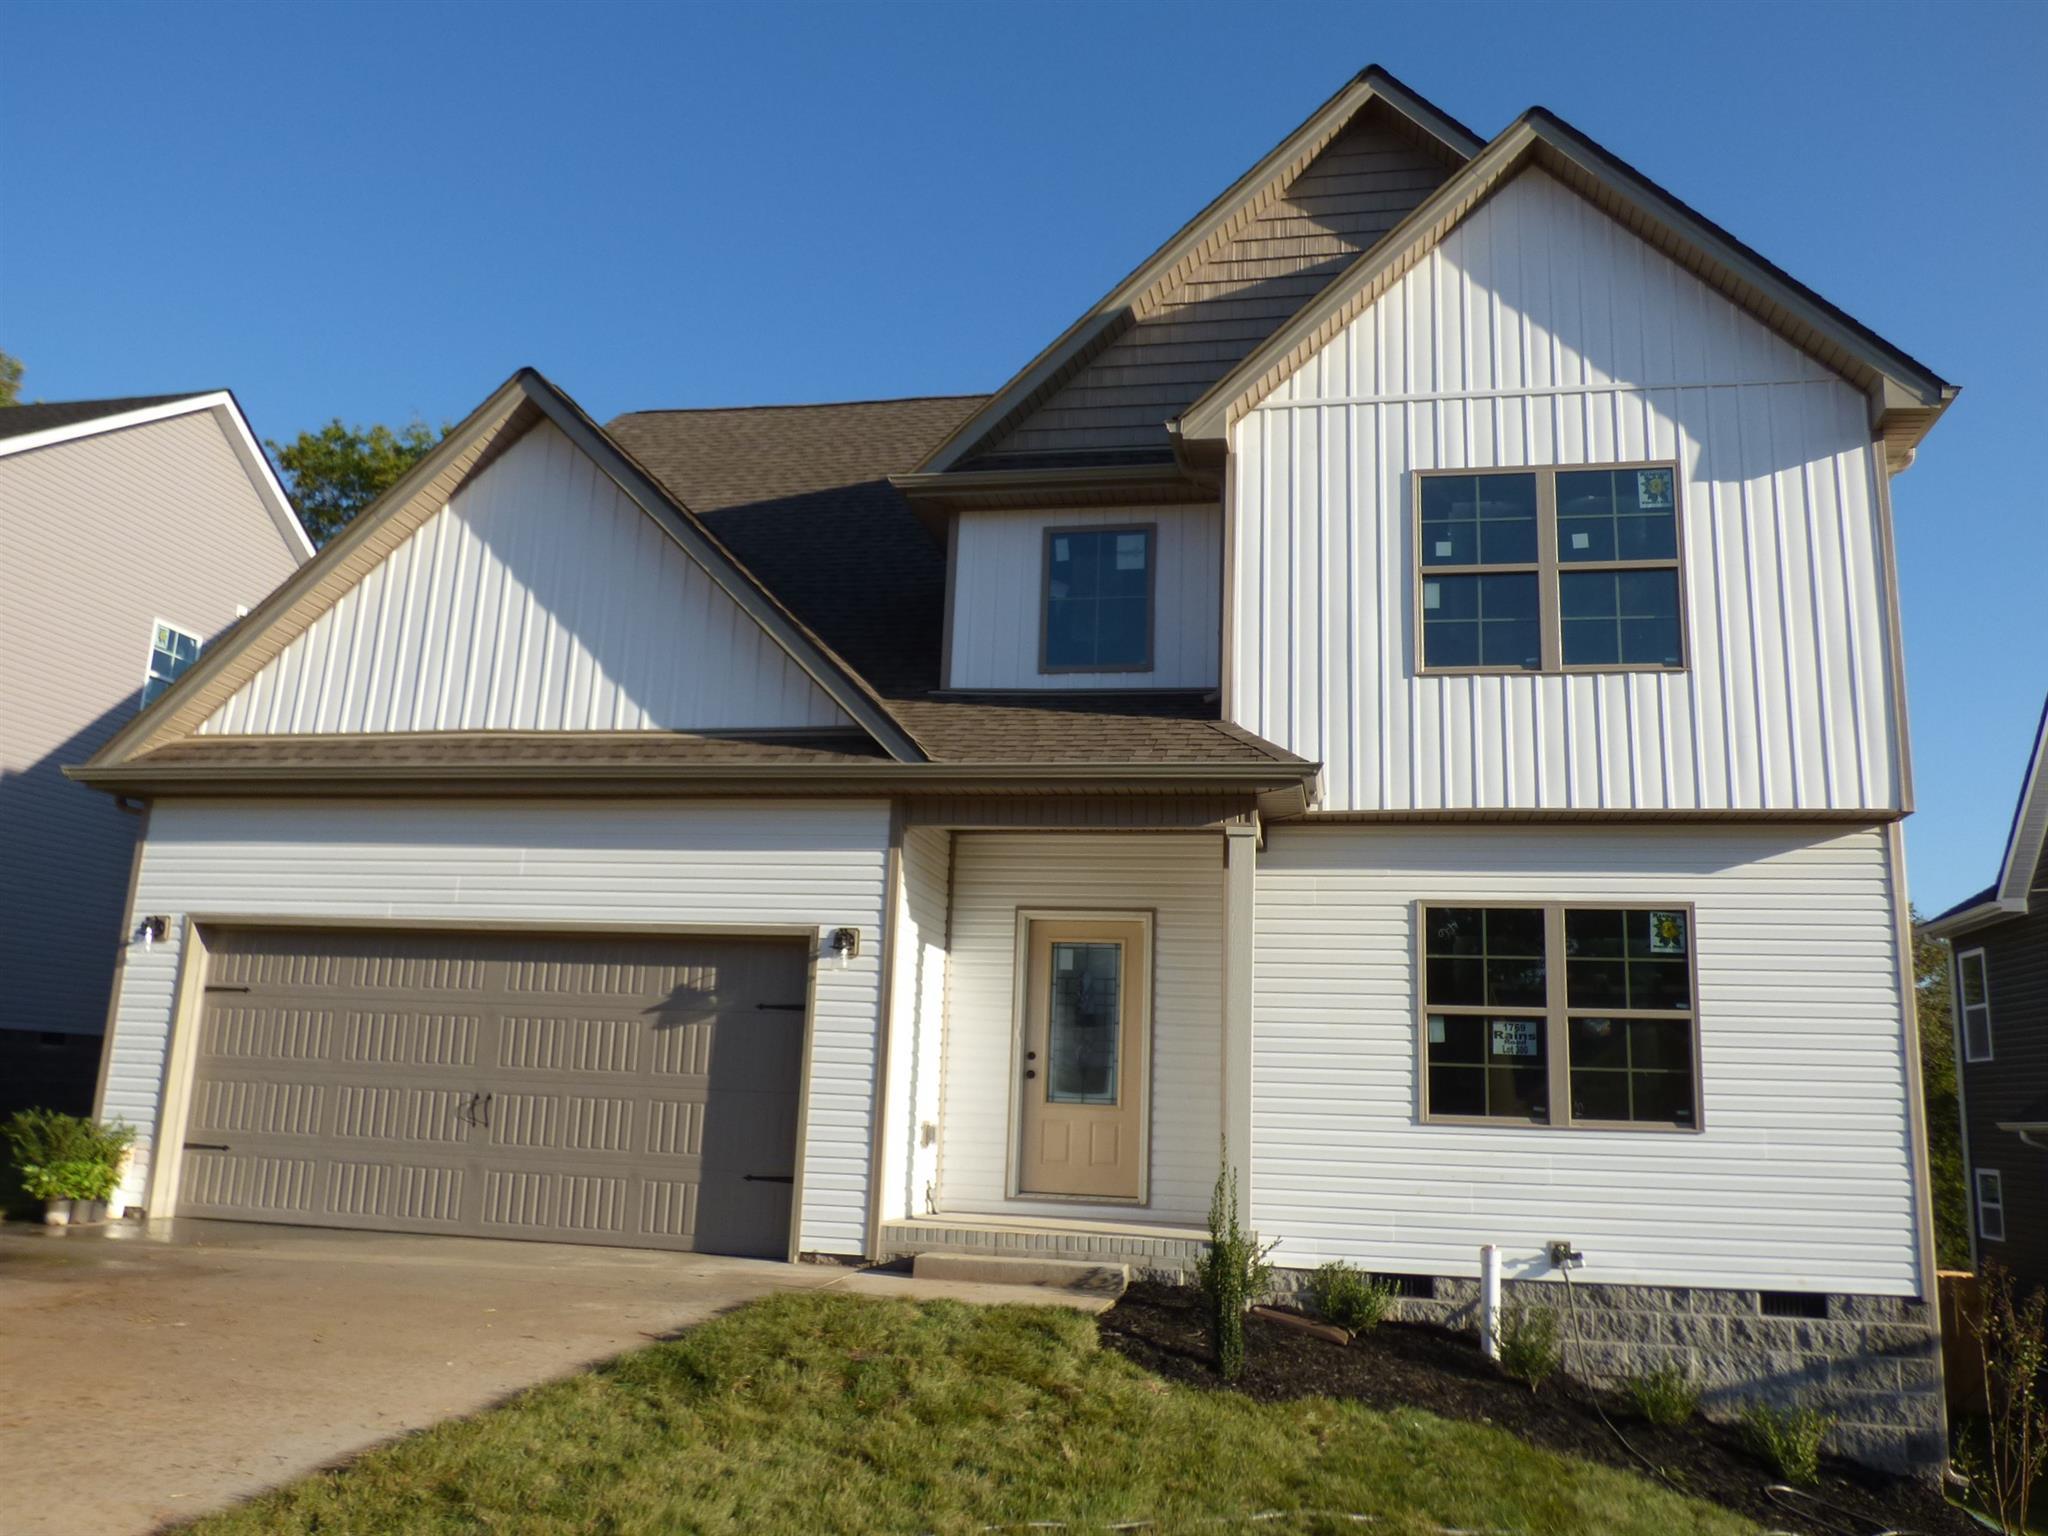 1769 Rains Rd, Clarksville, TN 37042 - Clarksville, TN real estate listing